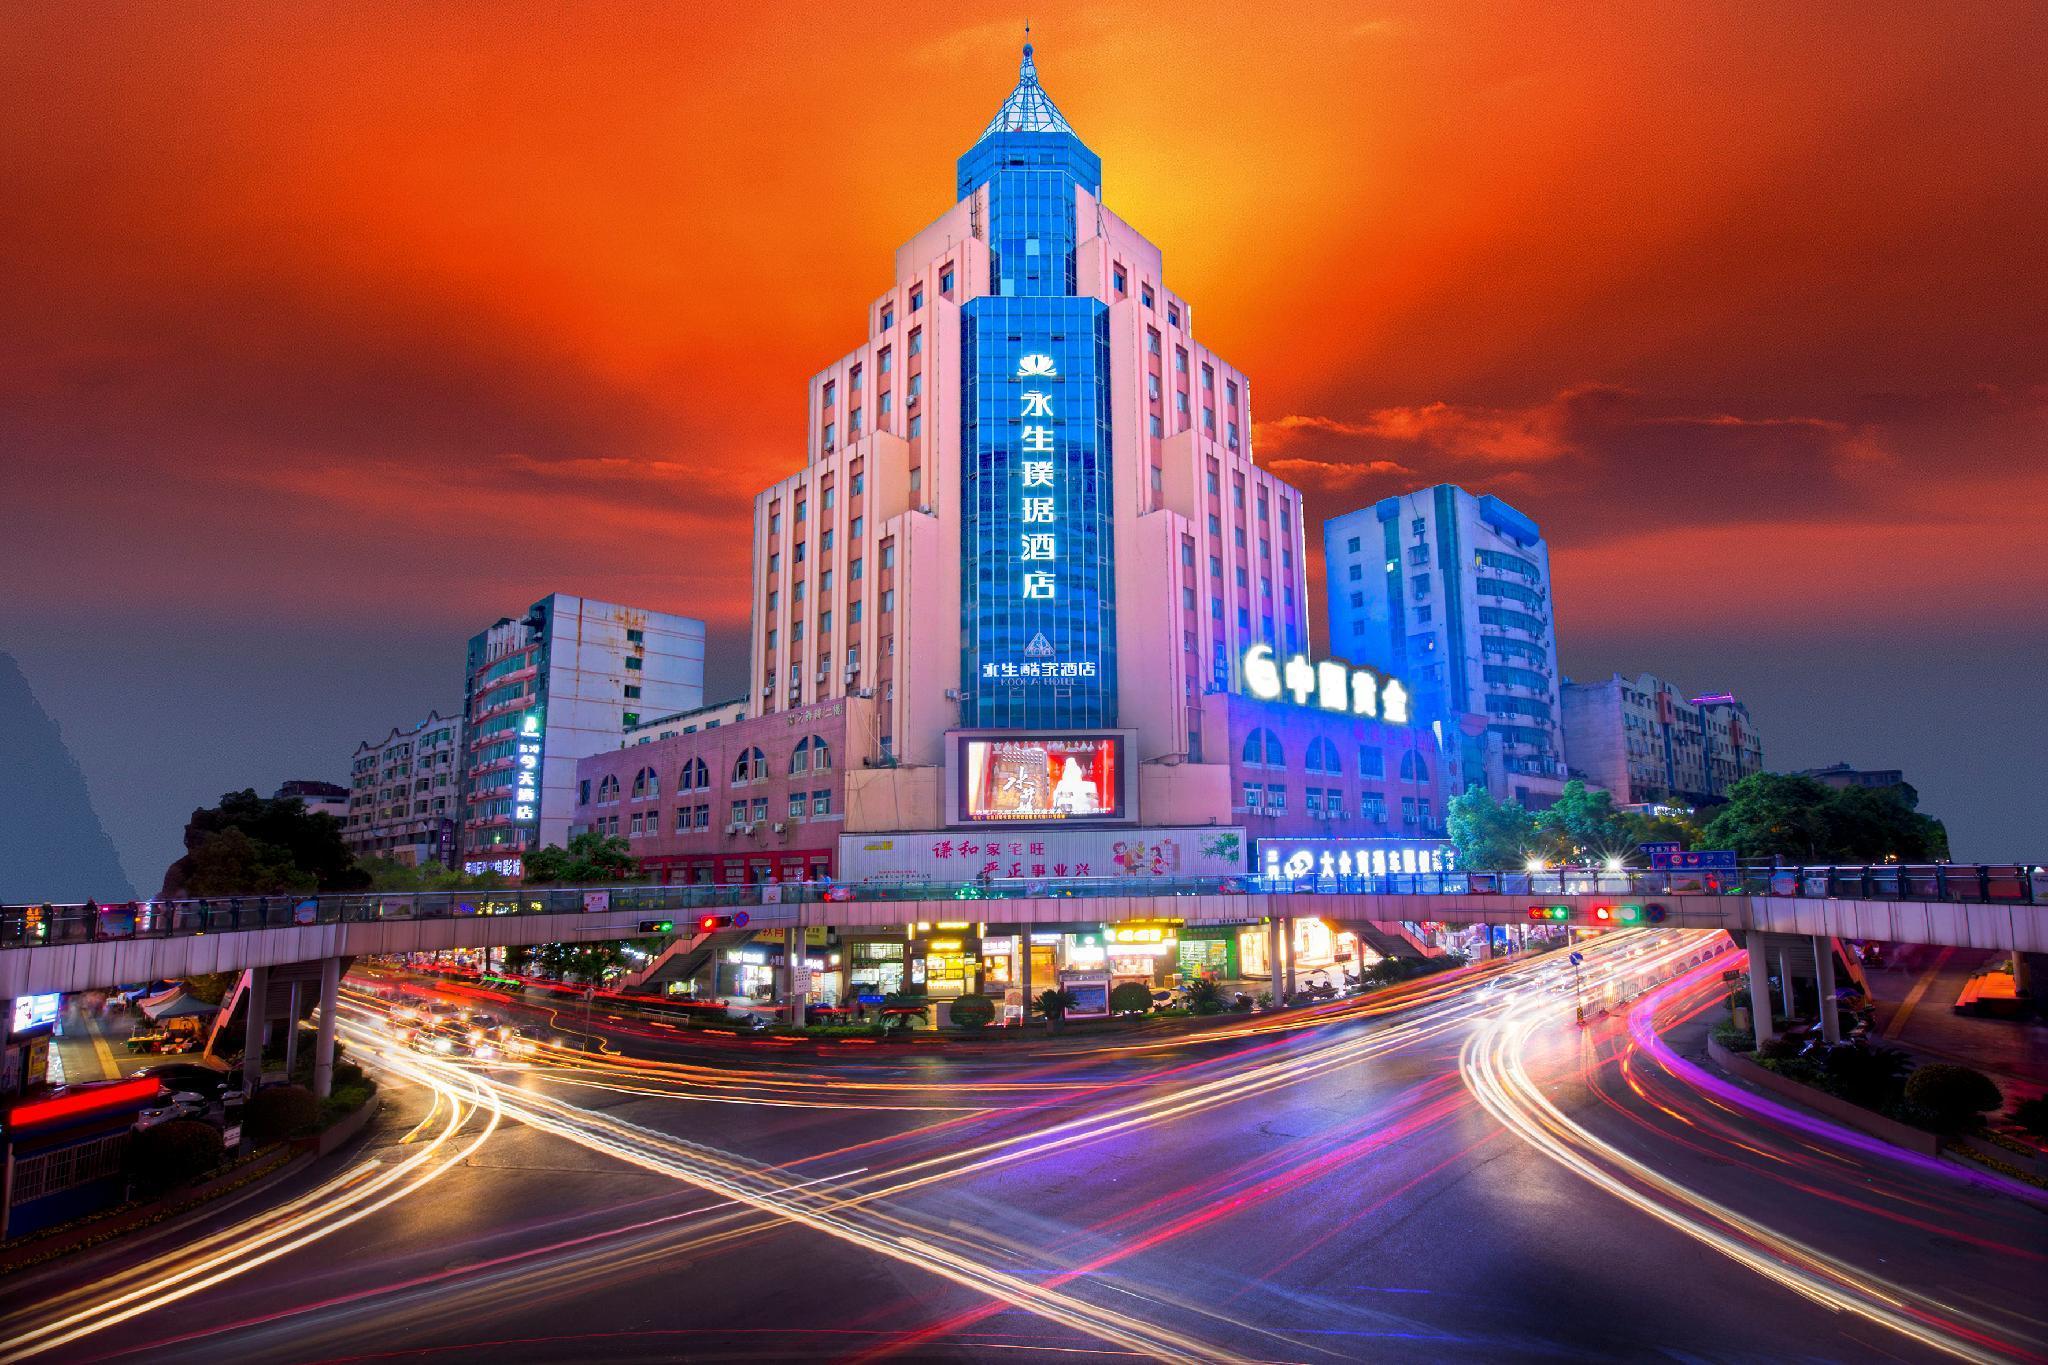 The Posh Hotel